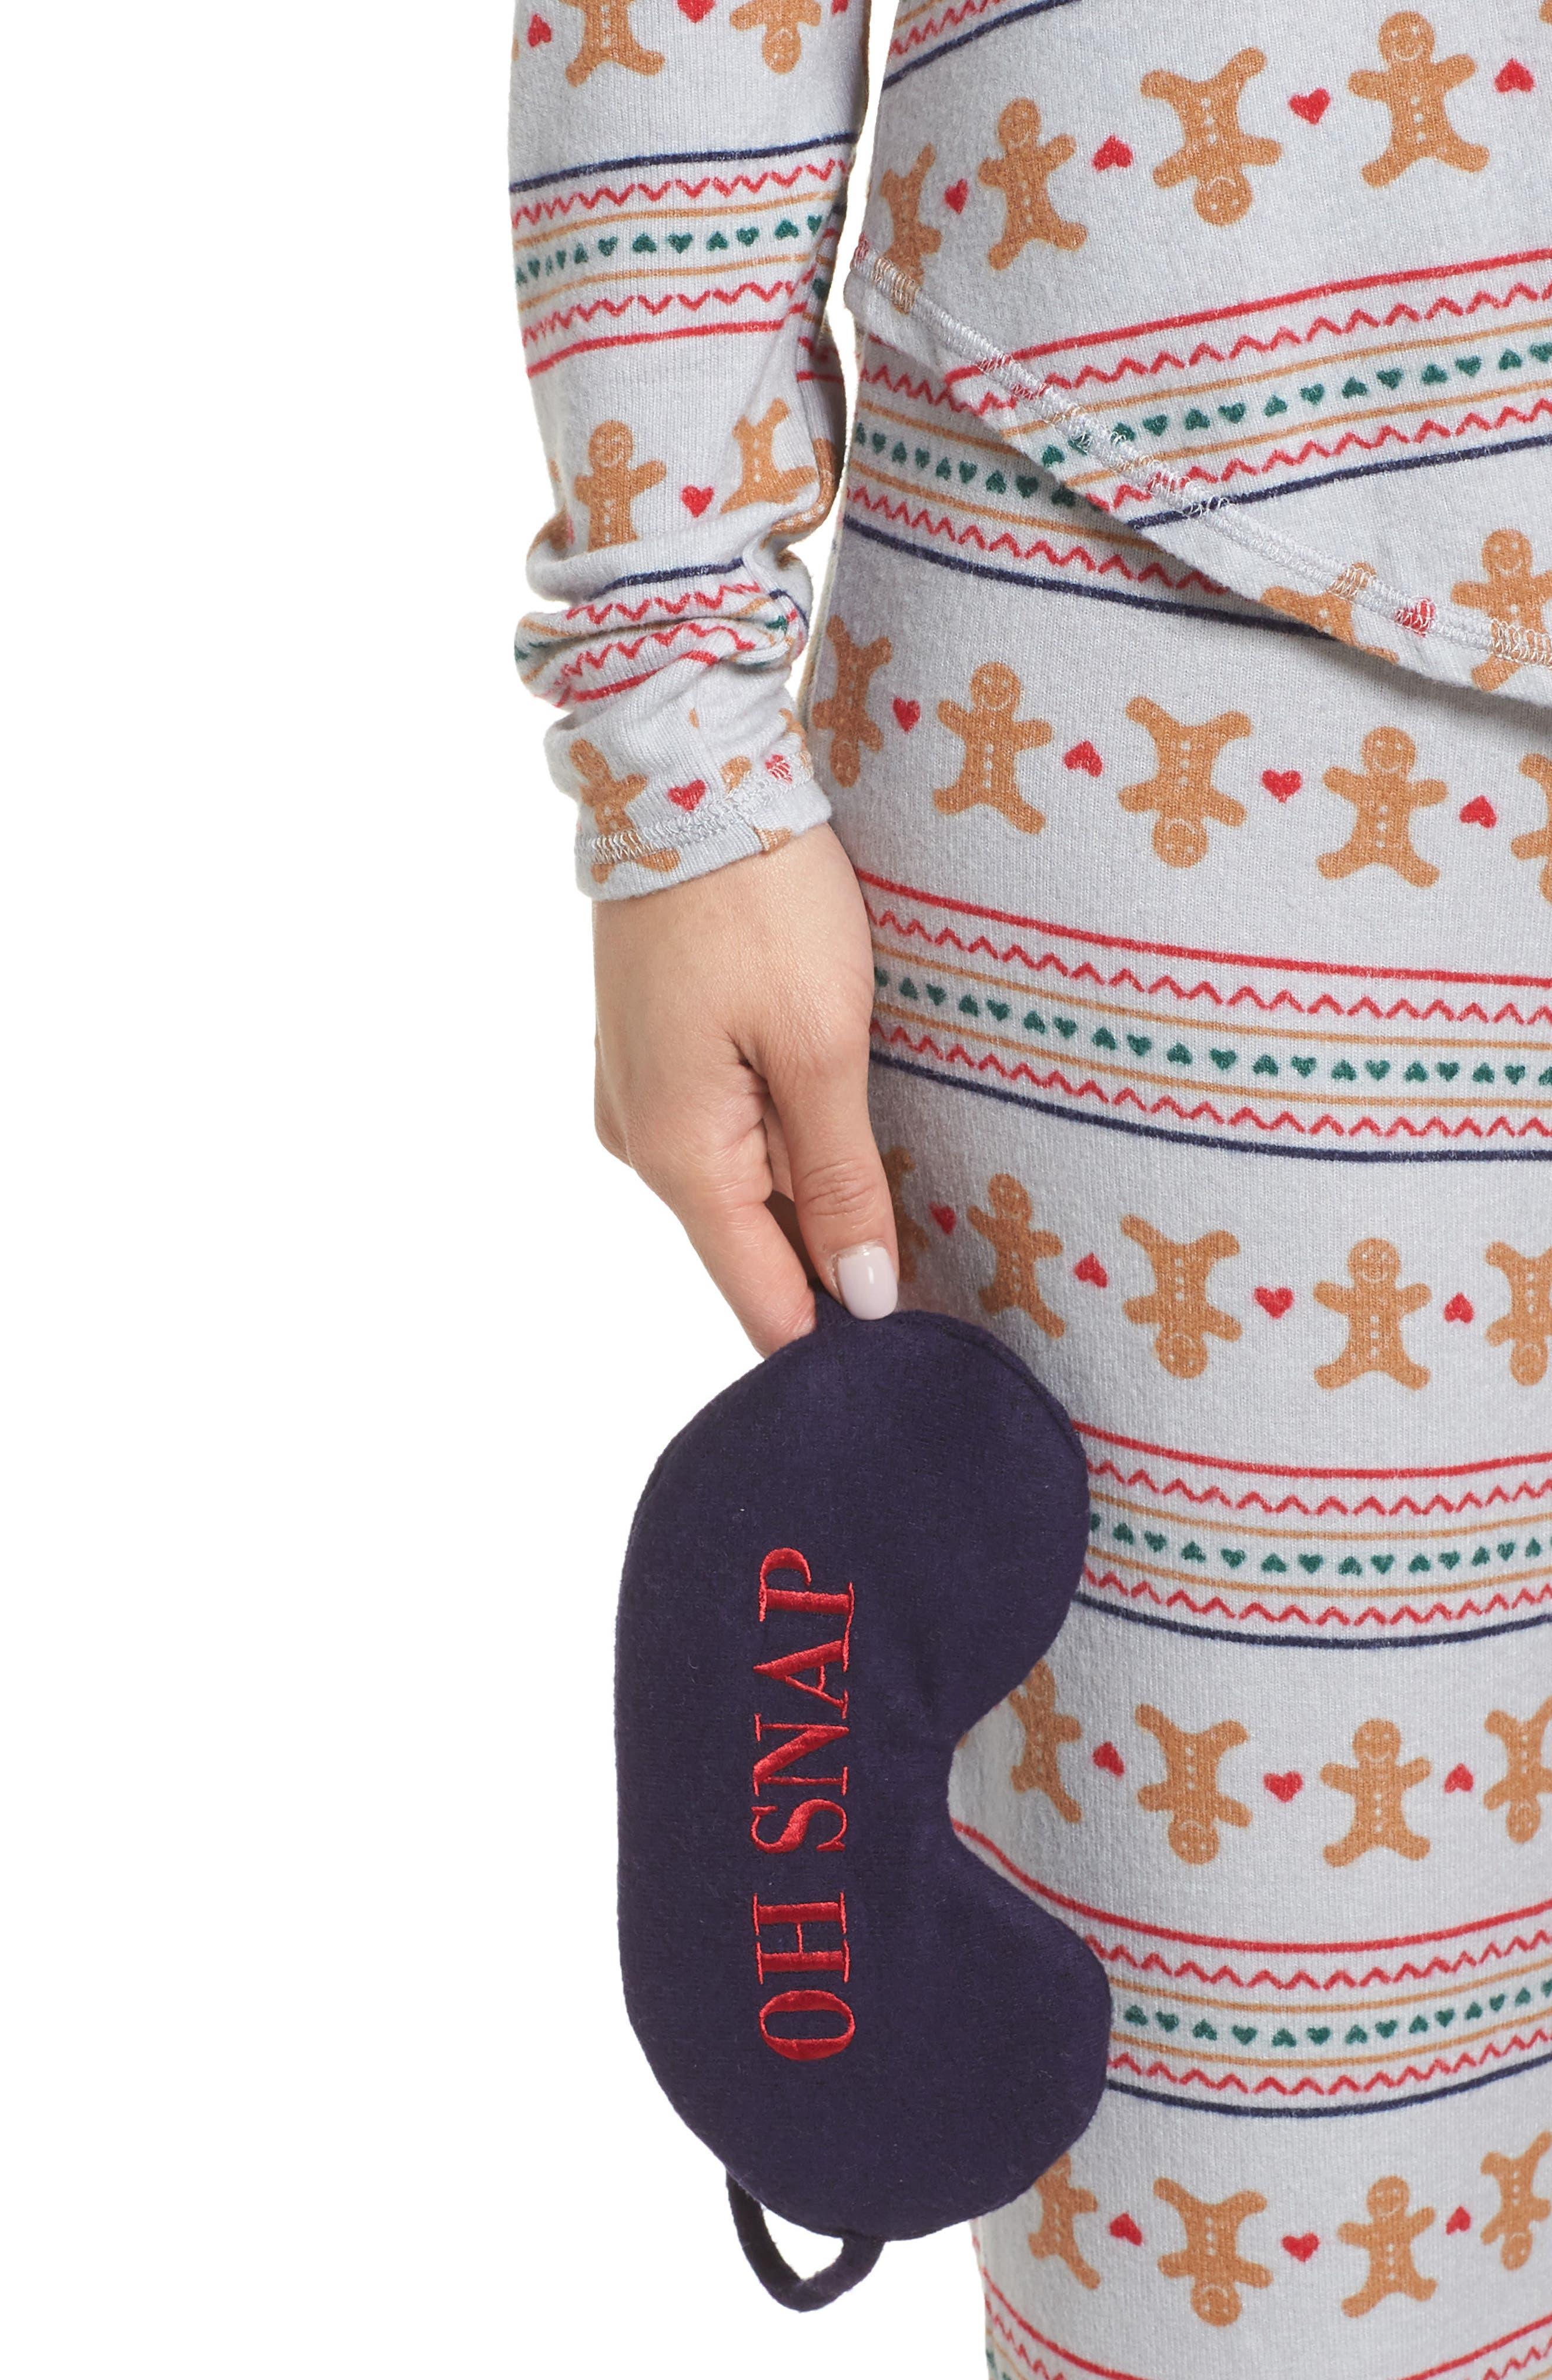 Knit Girlfriend Pajamas & Eye Mask,                             Alternate thumbnail 4, color,                             GREY MICRO GINGERBREAD